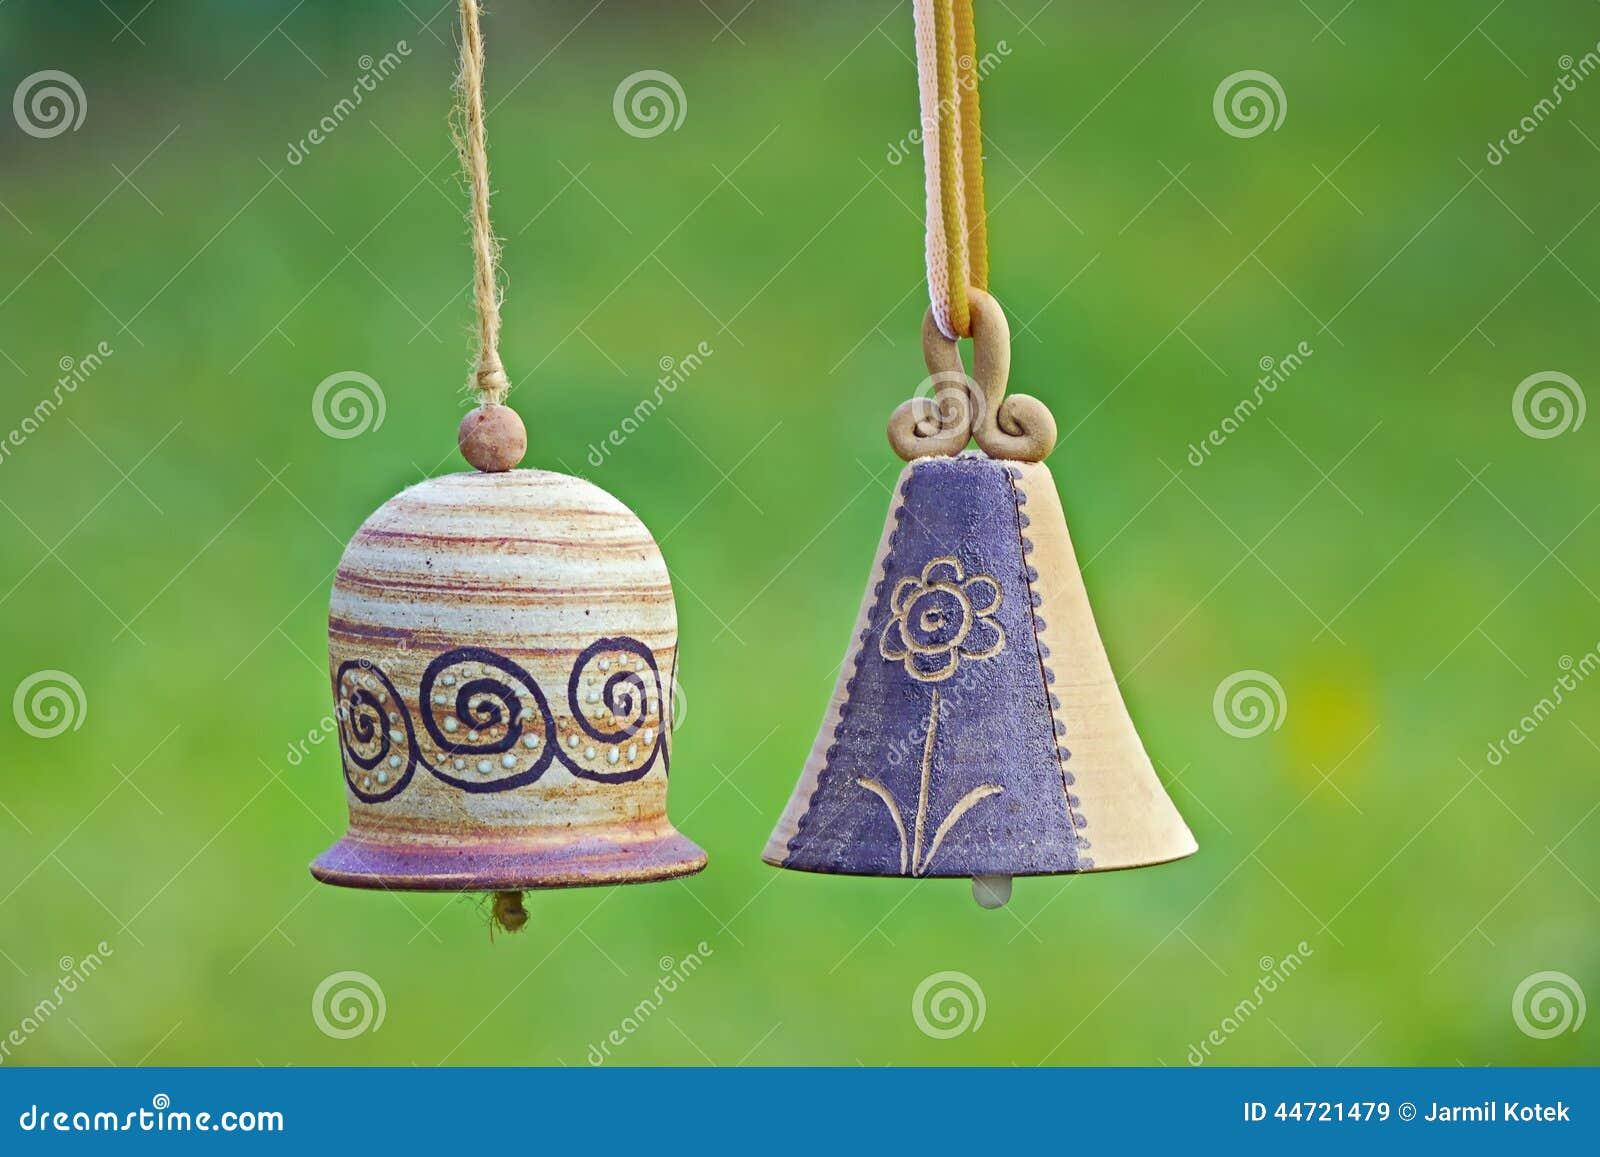 Ceramic Bells In Garden Stock Photo Image 44721479